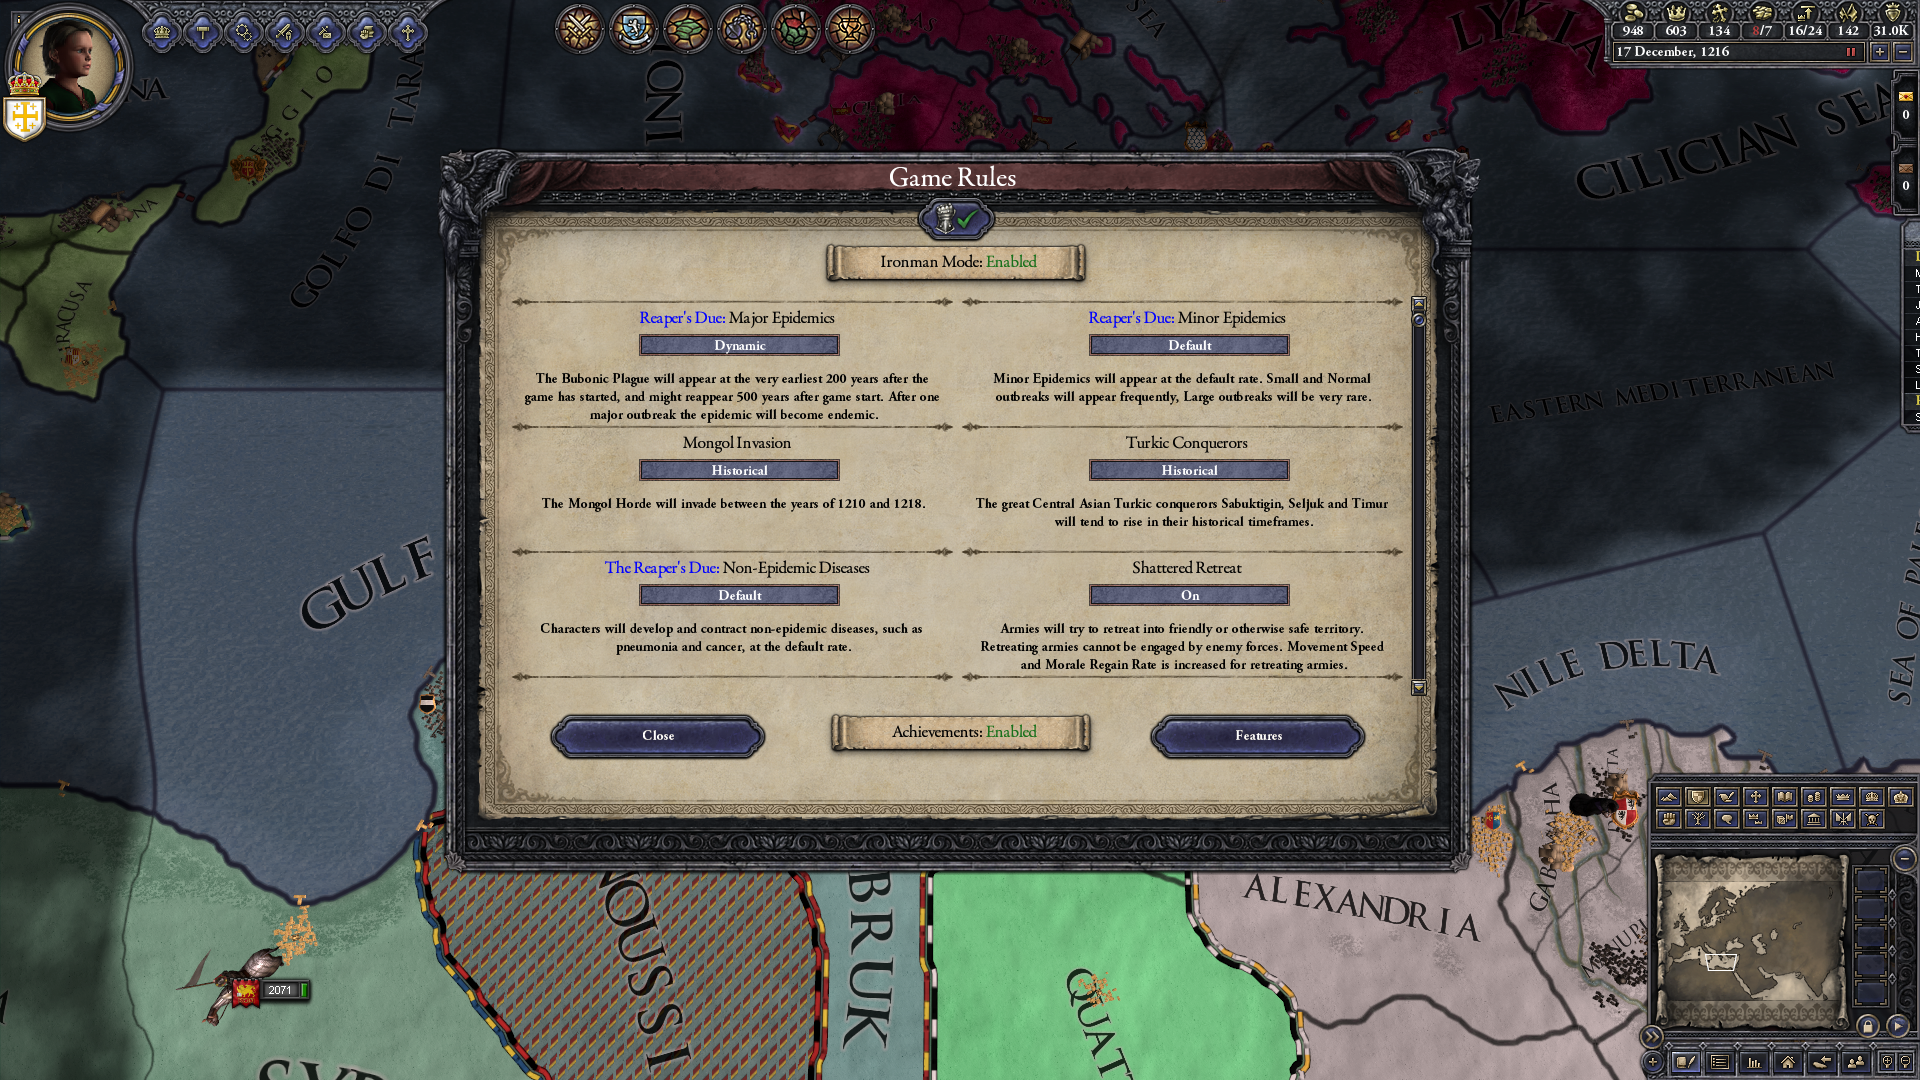 does adding a DLC mid way through an ironman game break achievements